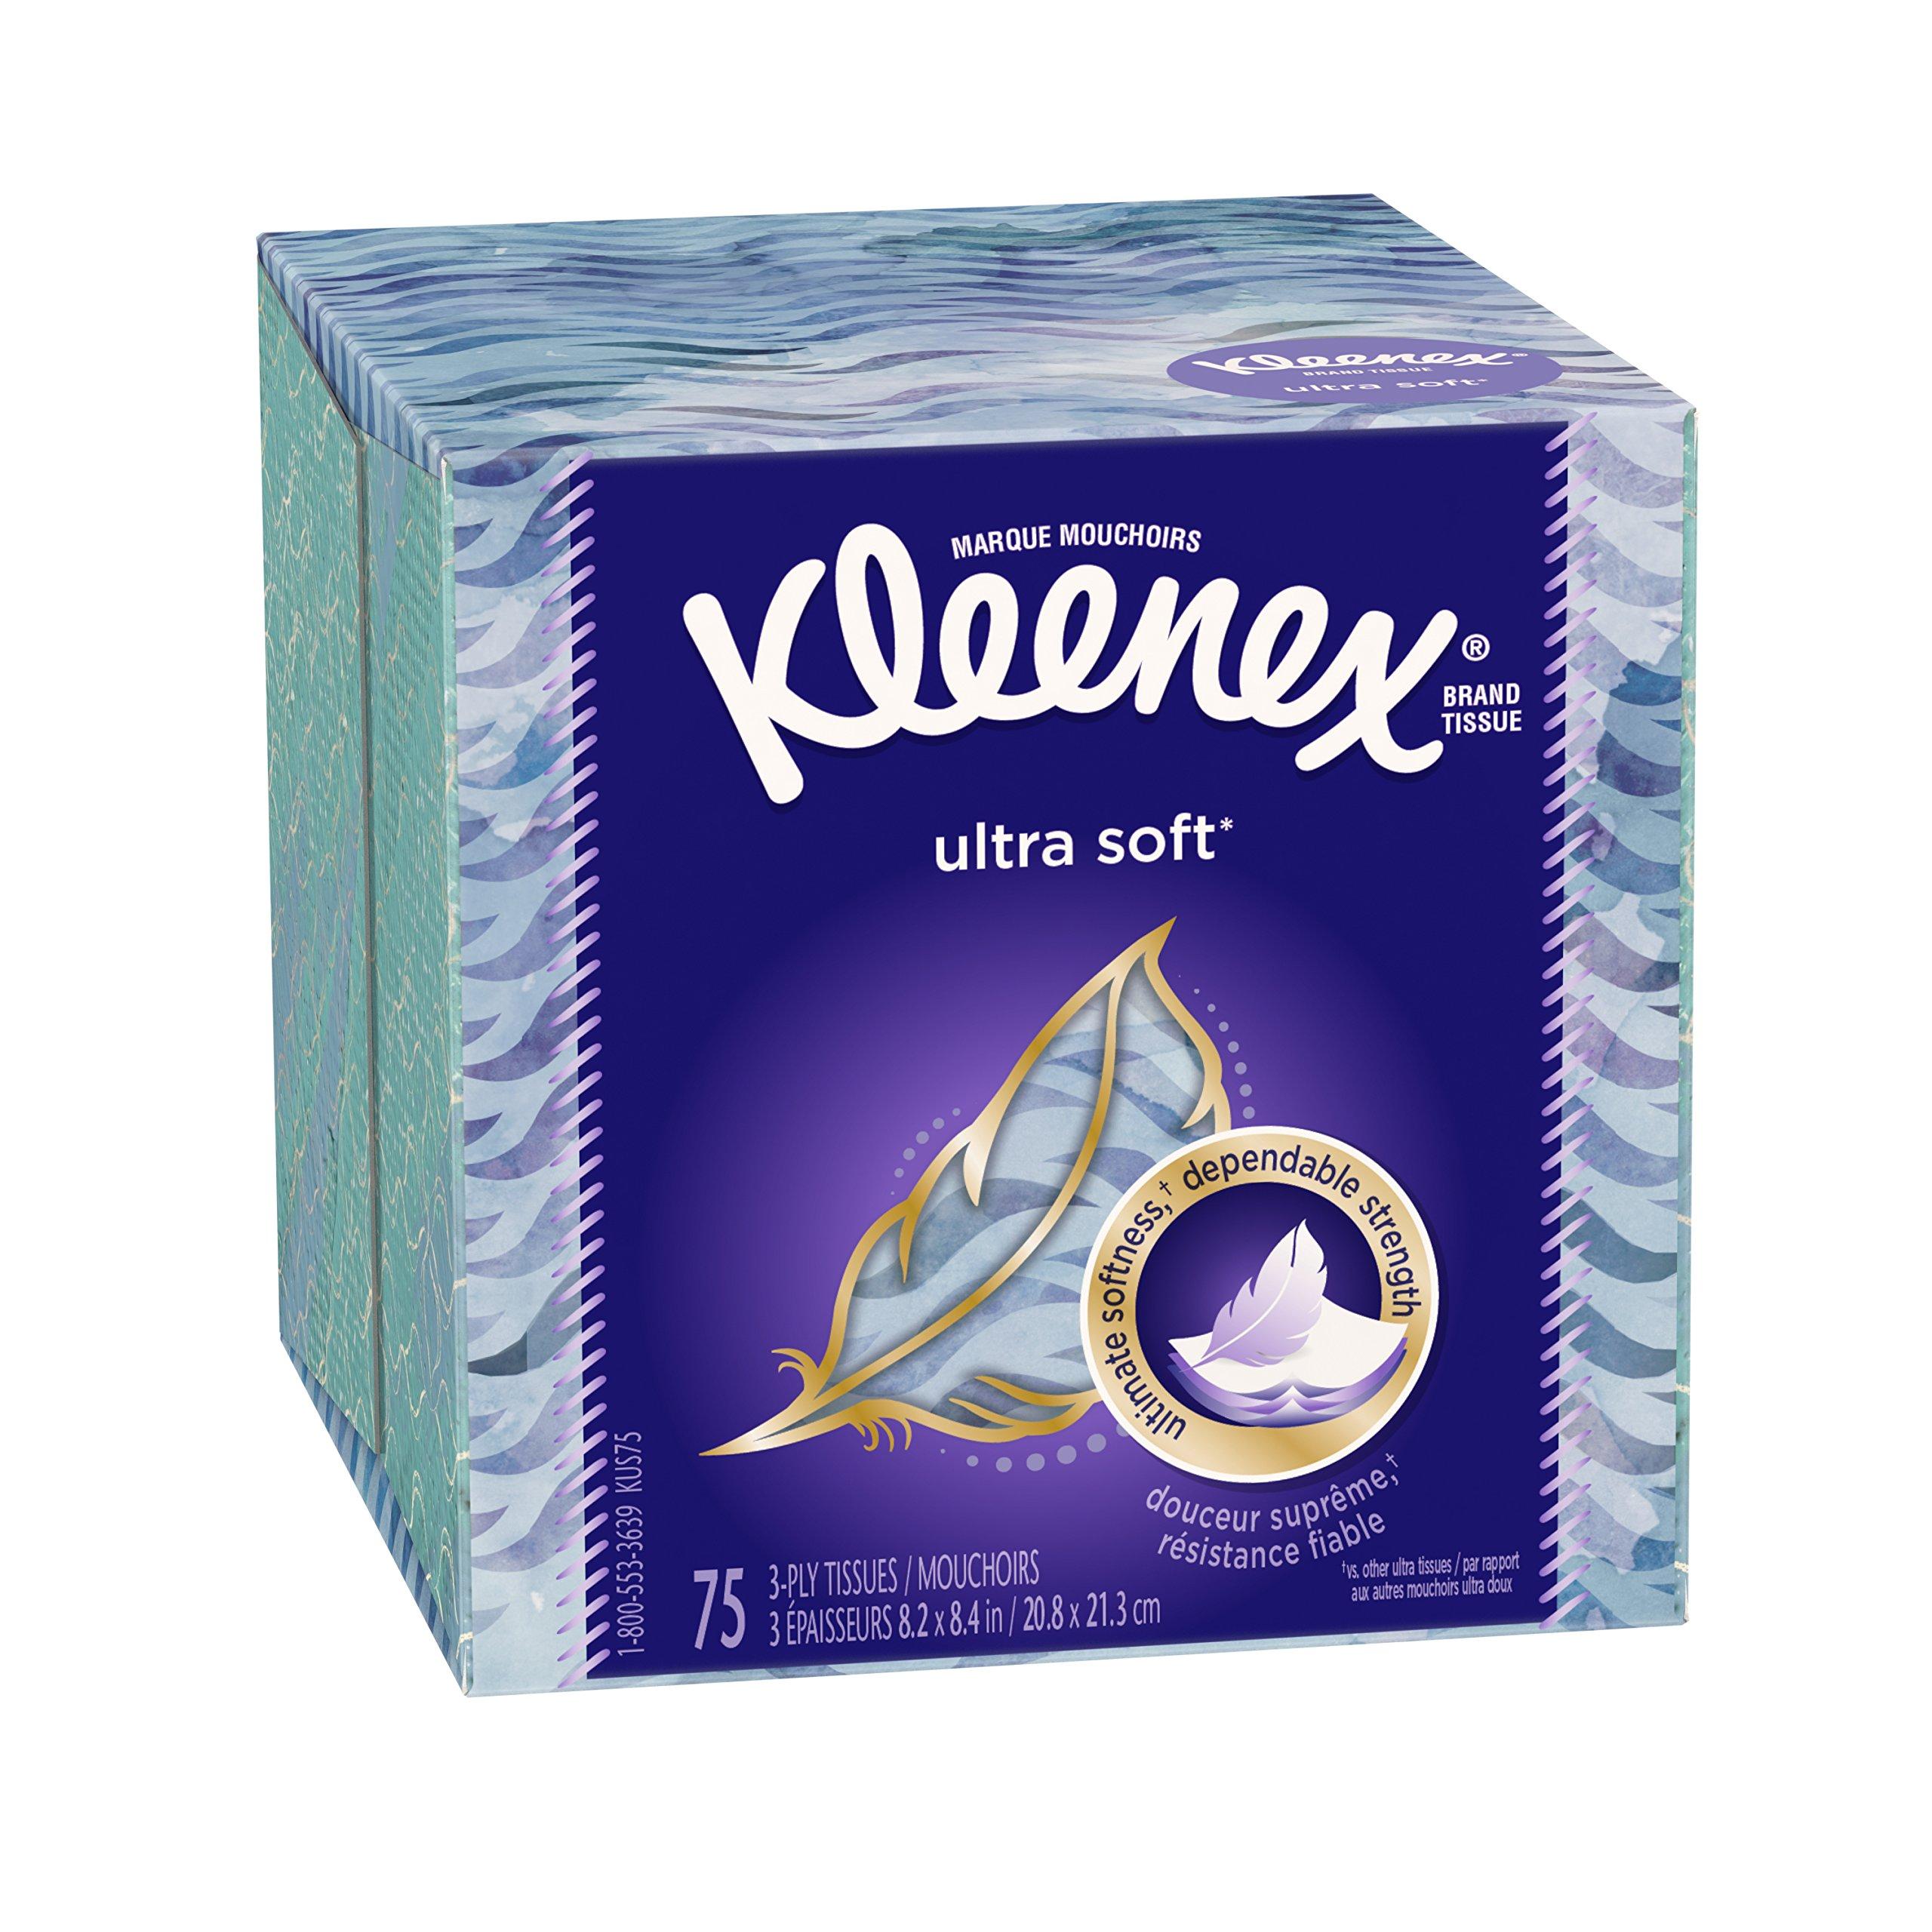 Kleenex, Facial Tissue, Upright Ultra Soft, 75 ct